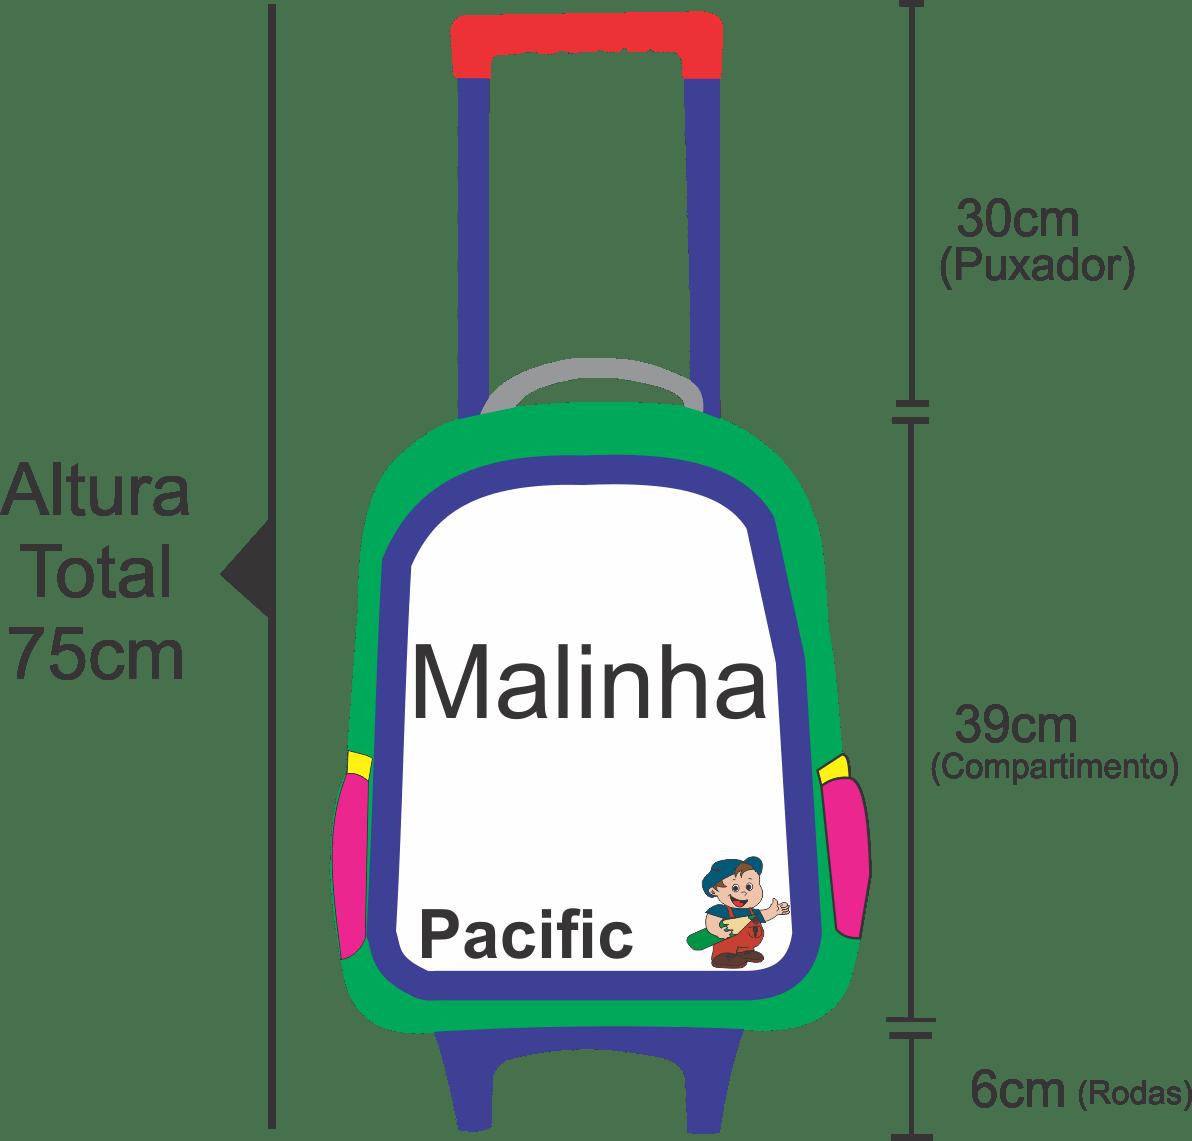 Medidas da altura da malinha Pacific